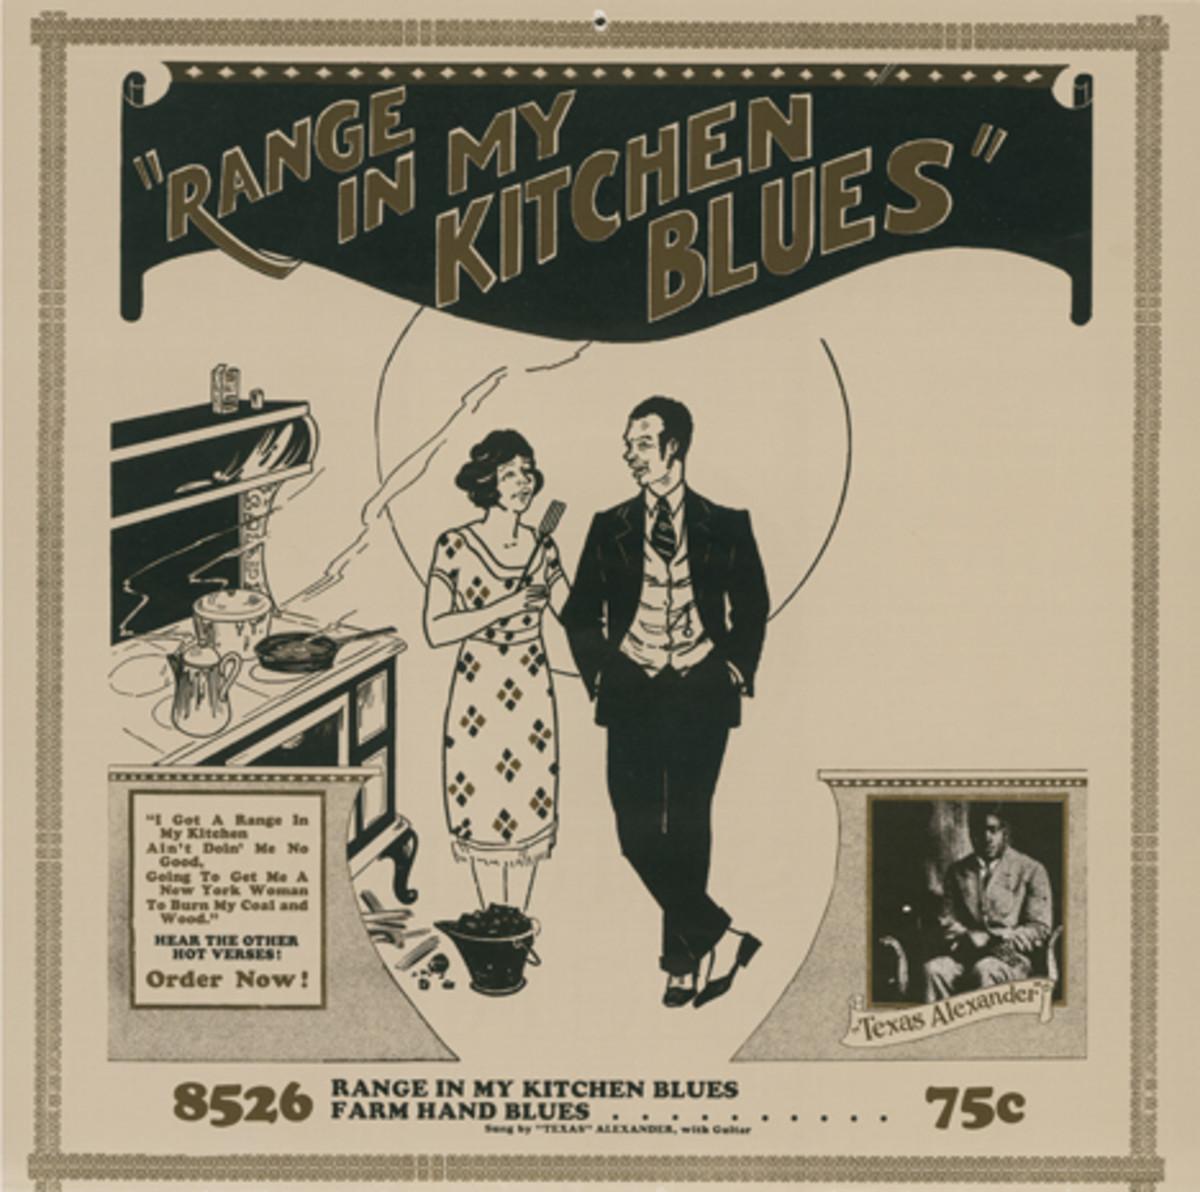 Range In My Kitchen Blues by Alger Texas Alexander